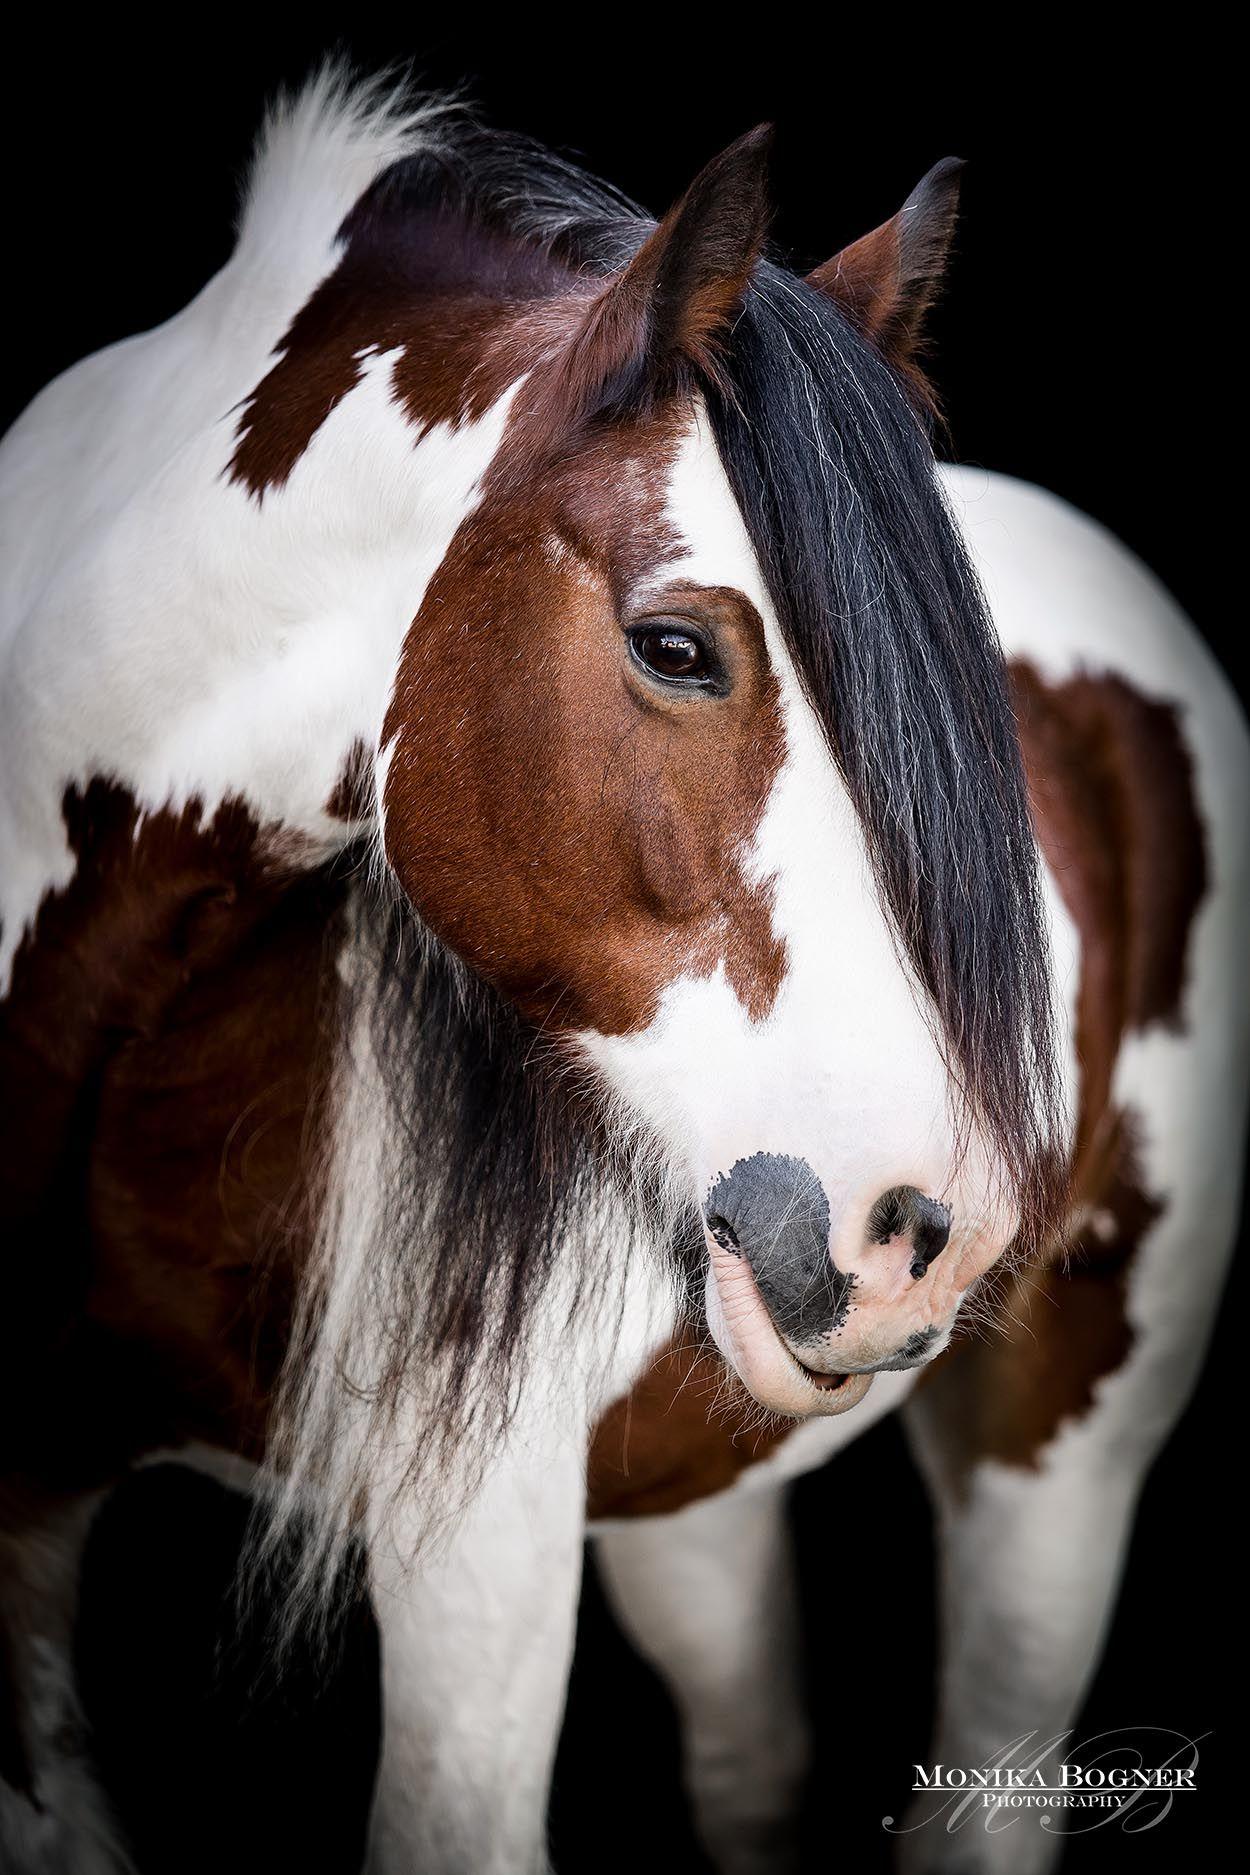 Tinker Irish Cob – Klassische Pferdeportraits vor schwarzen Hintergrund – Monika Bogner Photography